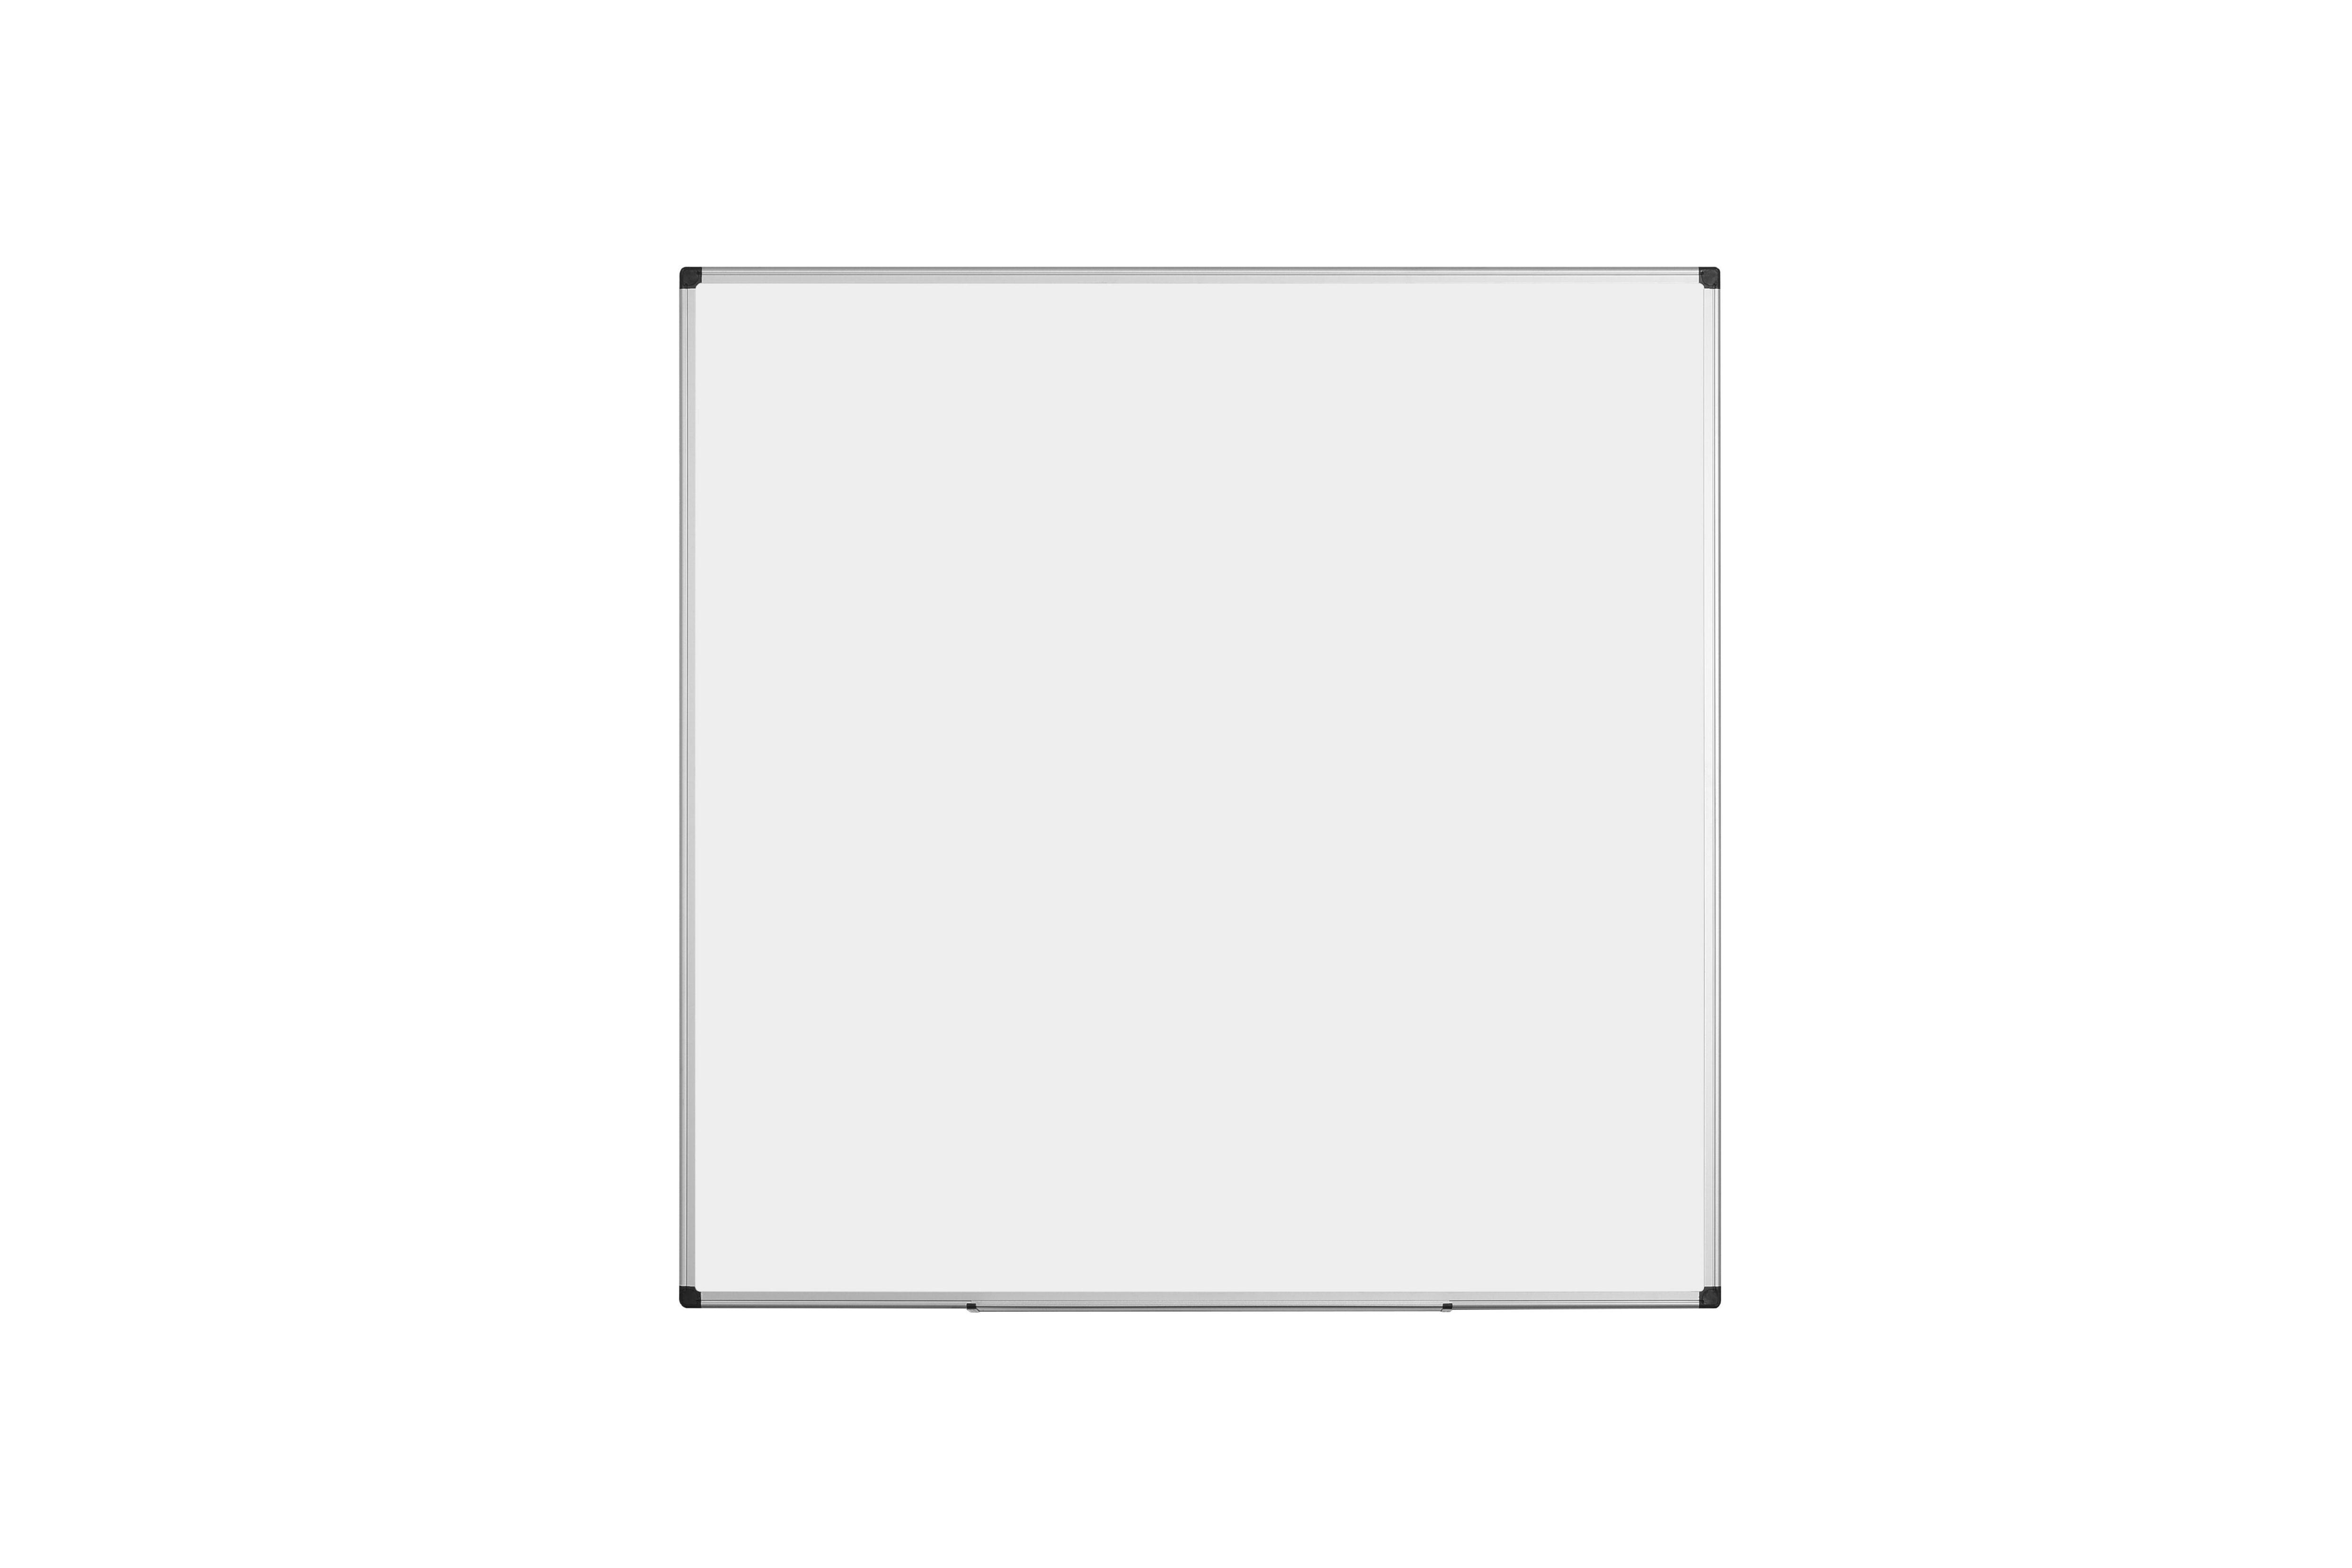 Magnetic Bi-Office Maya Enamel Aluminium Framed Wtbrd 120x120cm